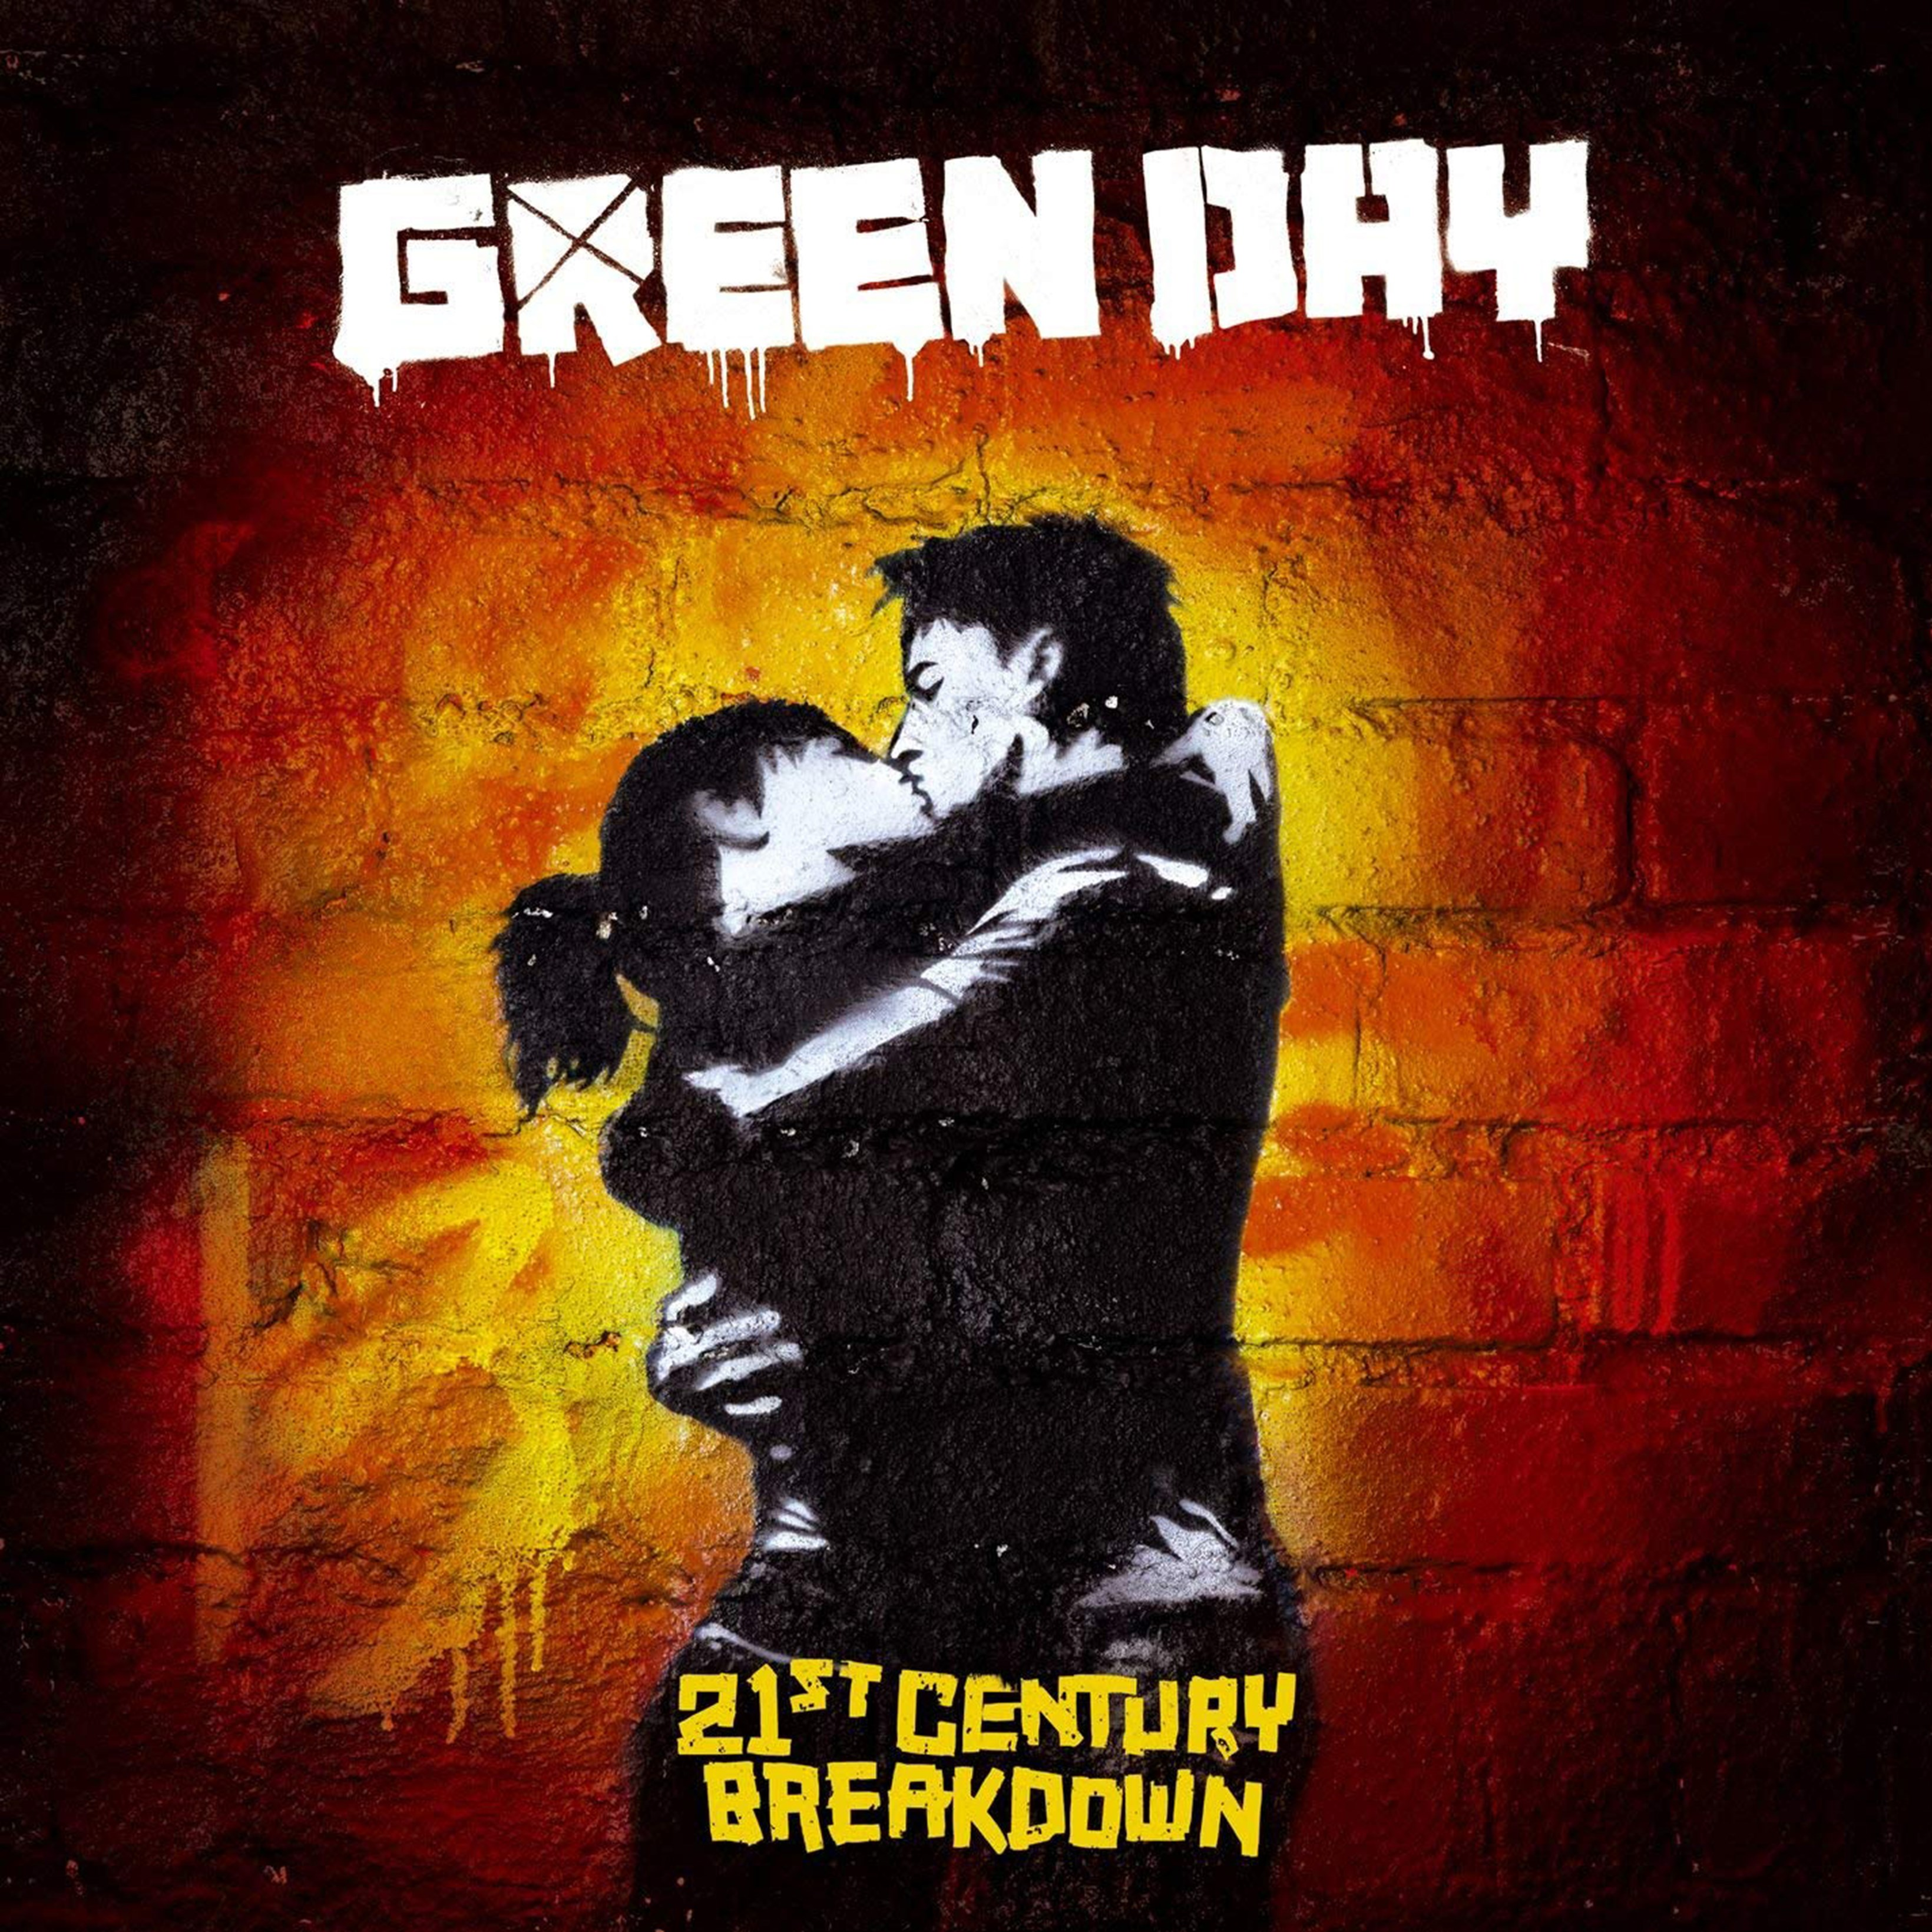 21st Century Breakdown - 1